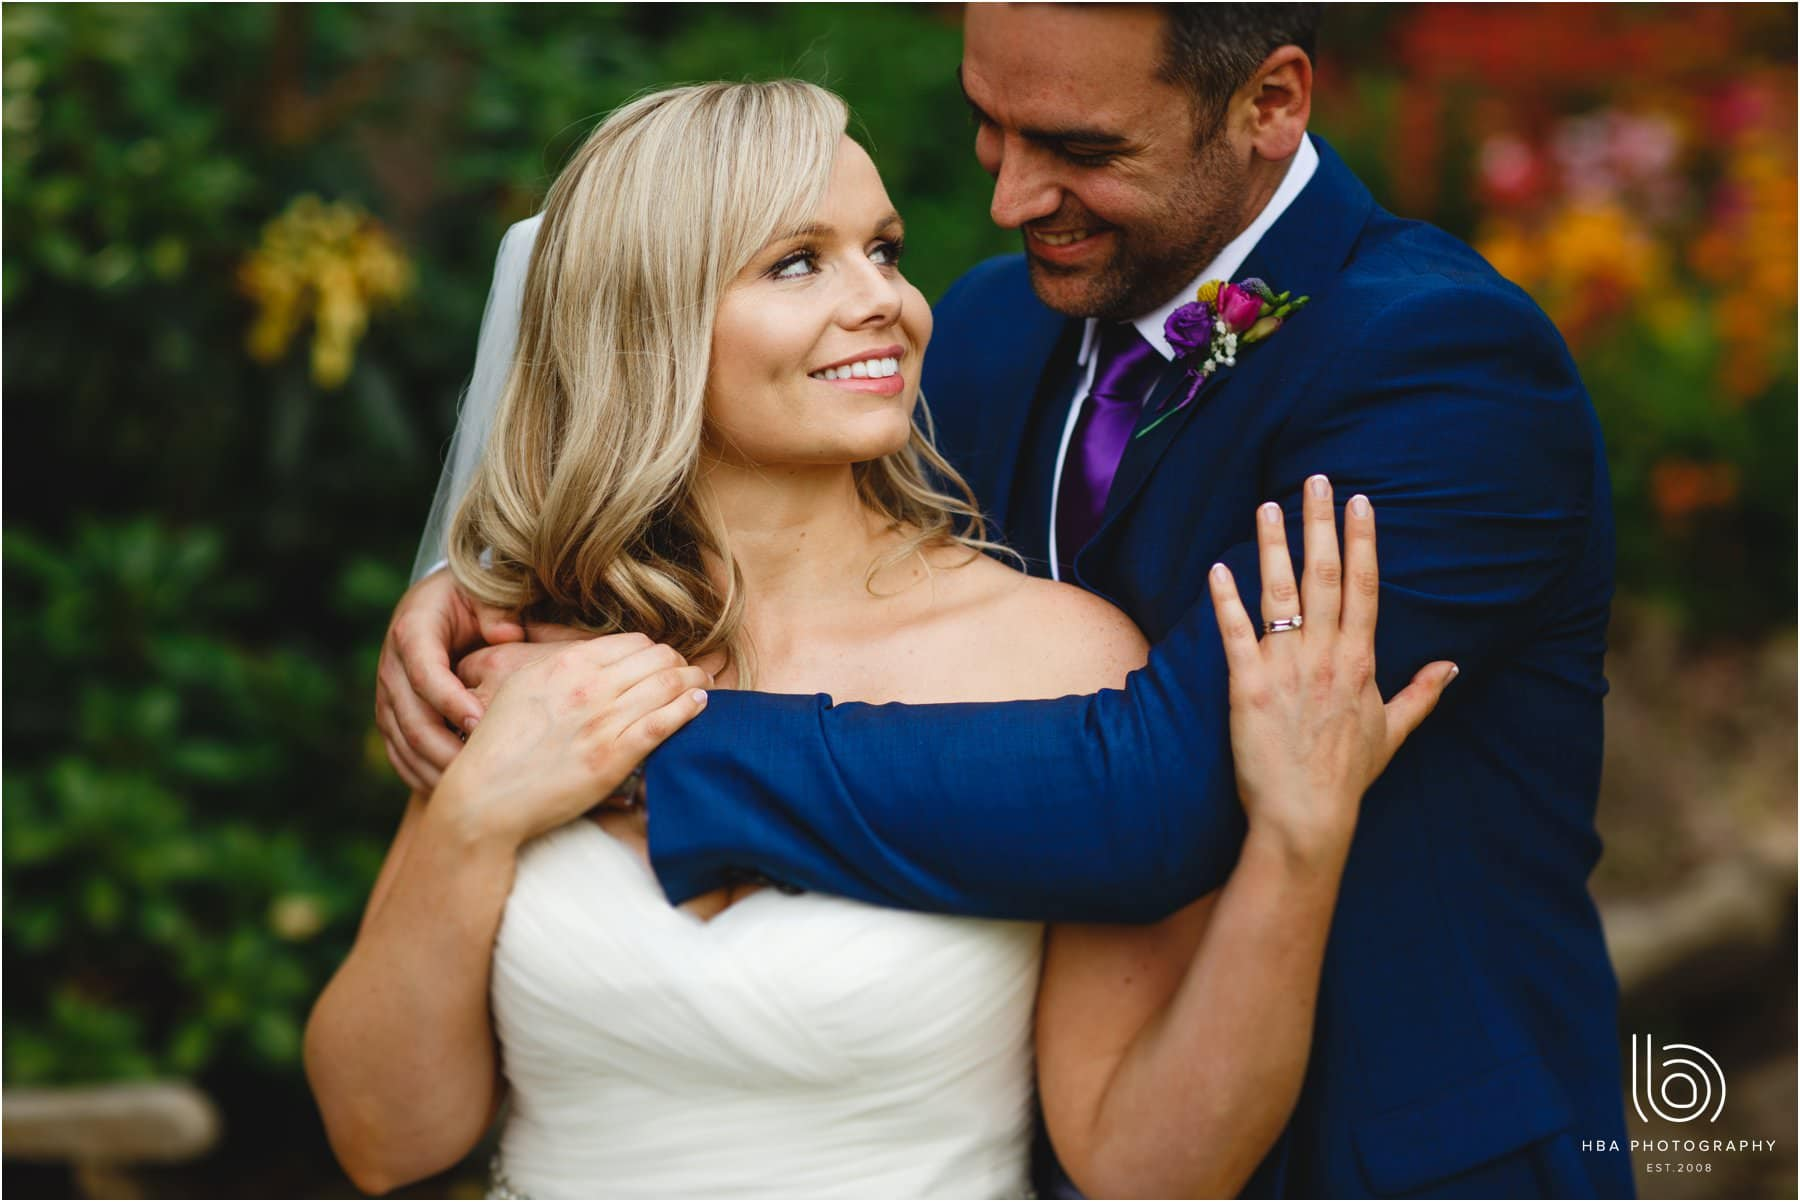 The bride & groom cuddling